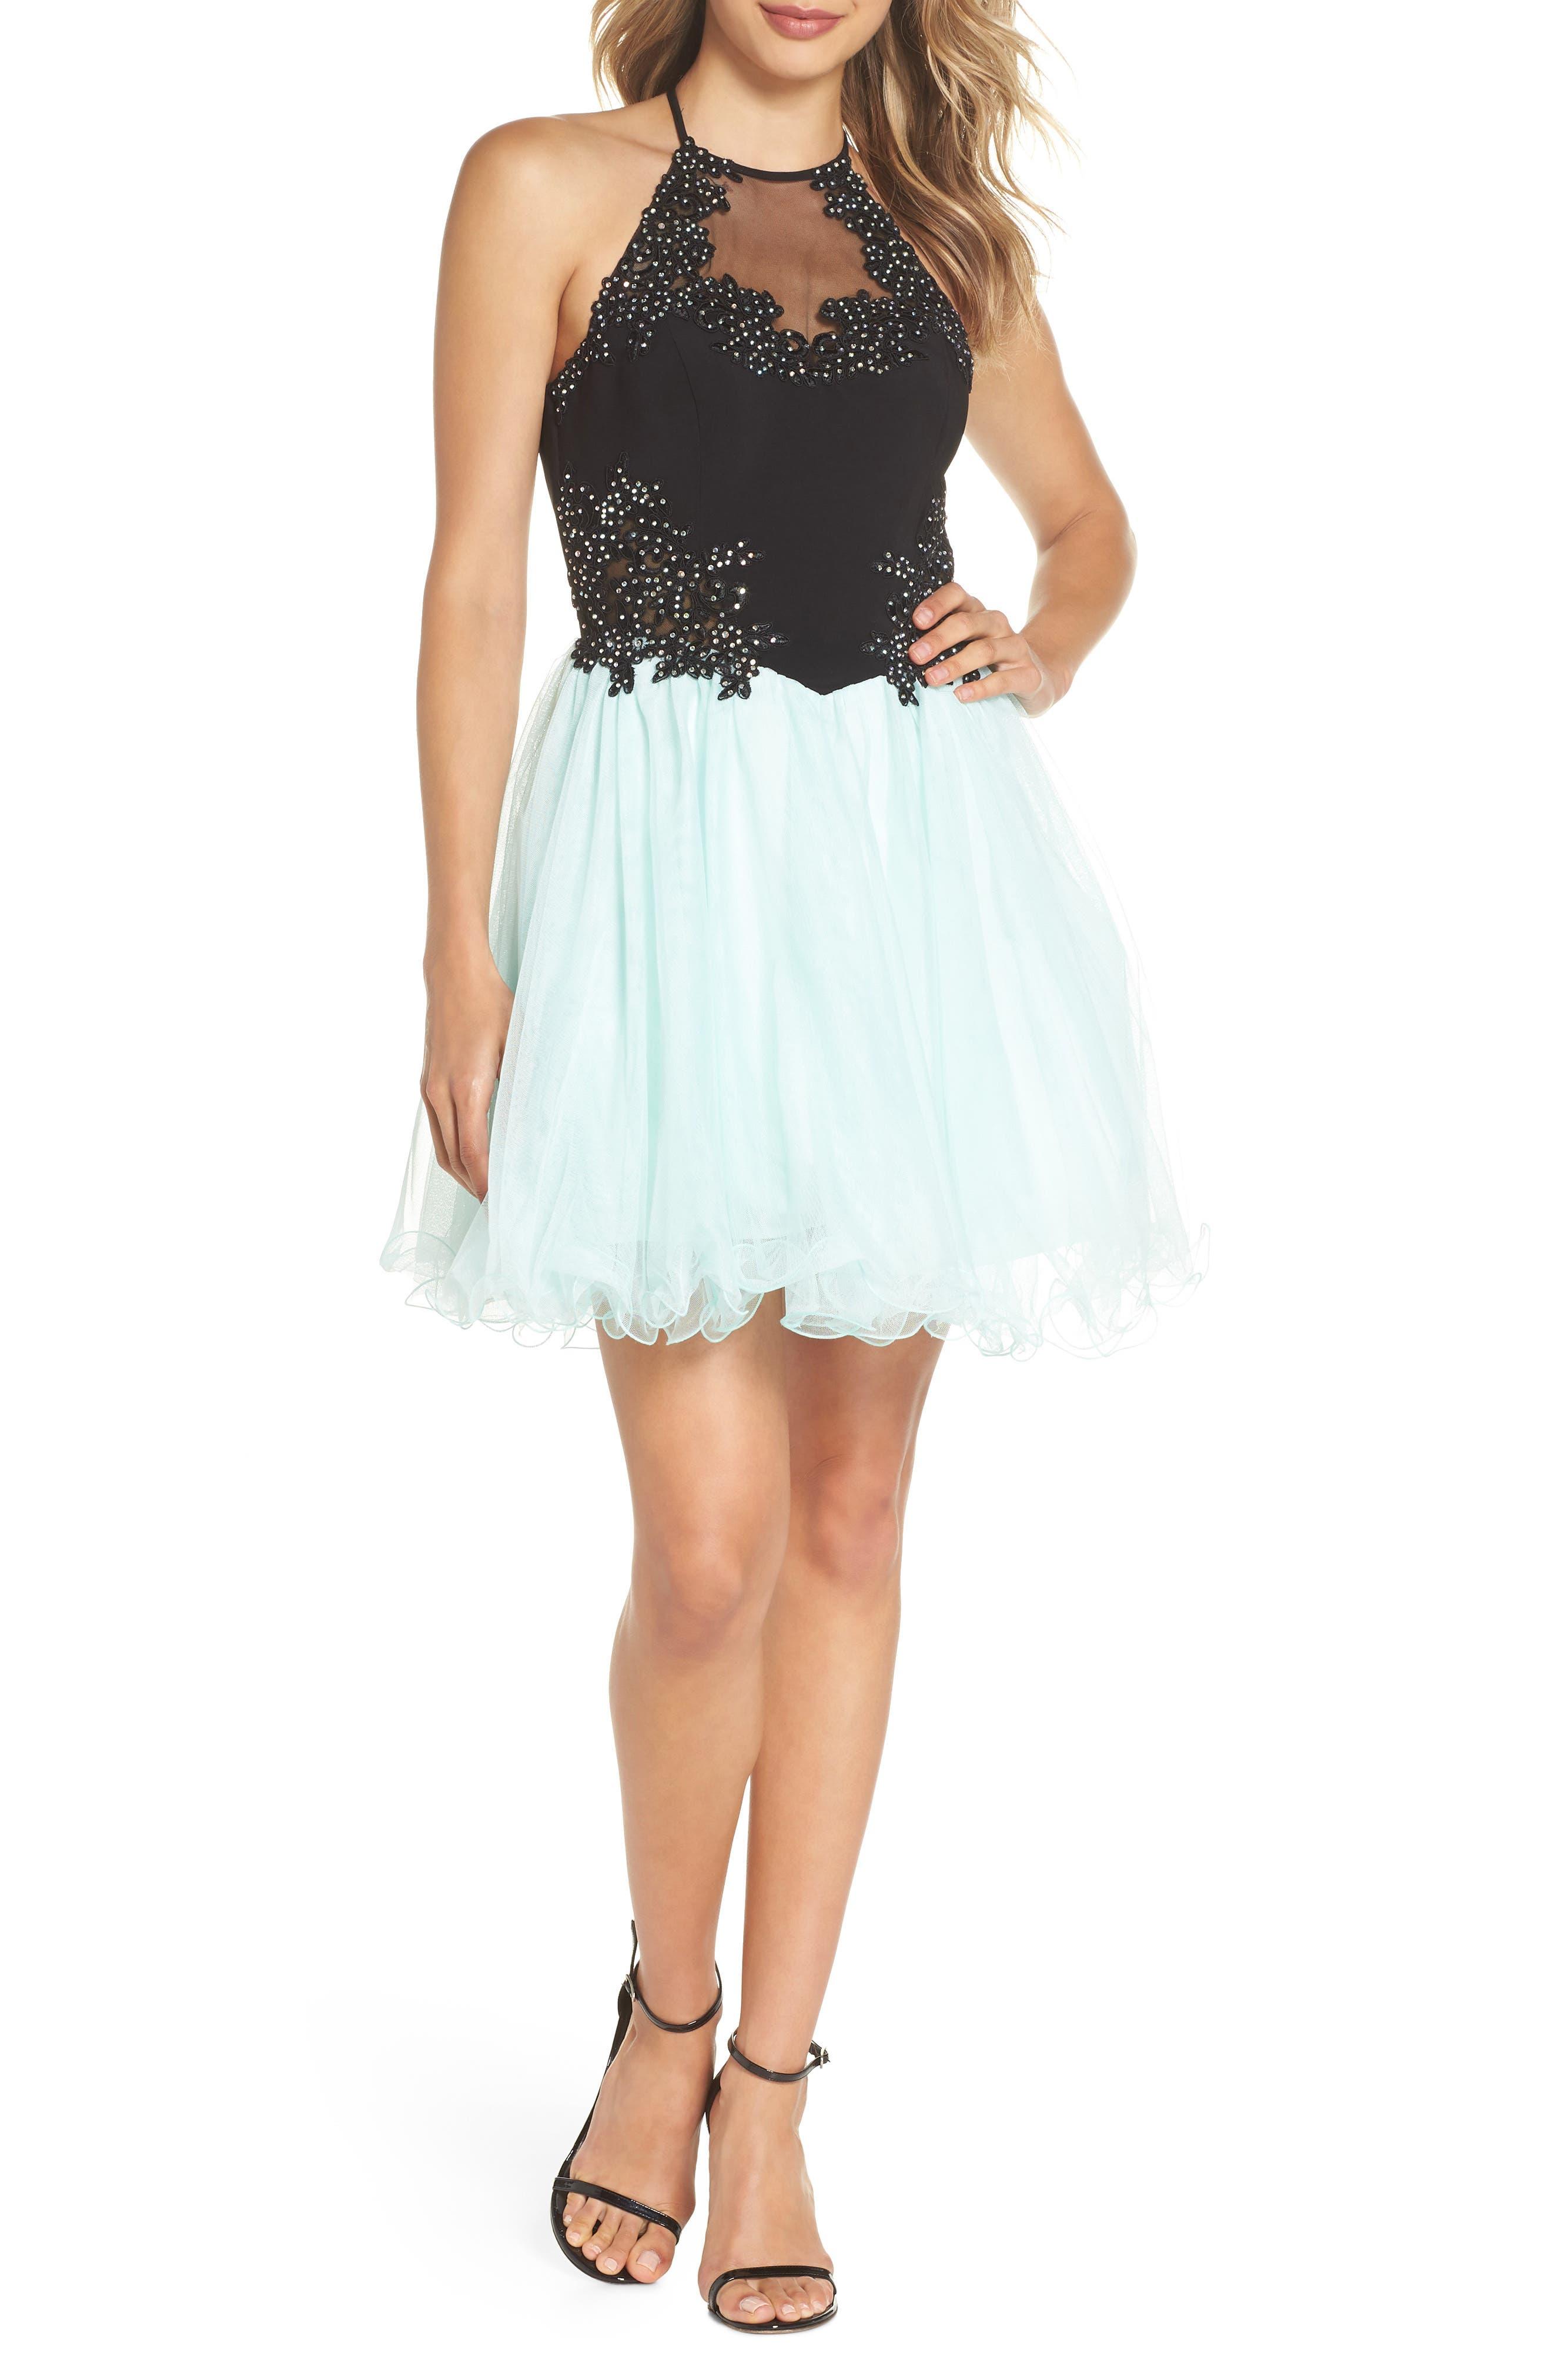 0a616f9a215 Blondie Nites Applique Mesh Fit   Flare Halter Dress